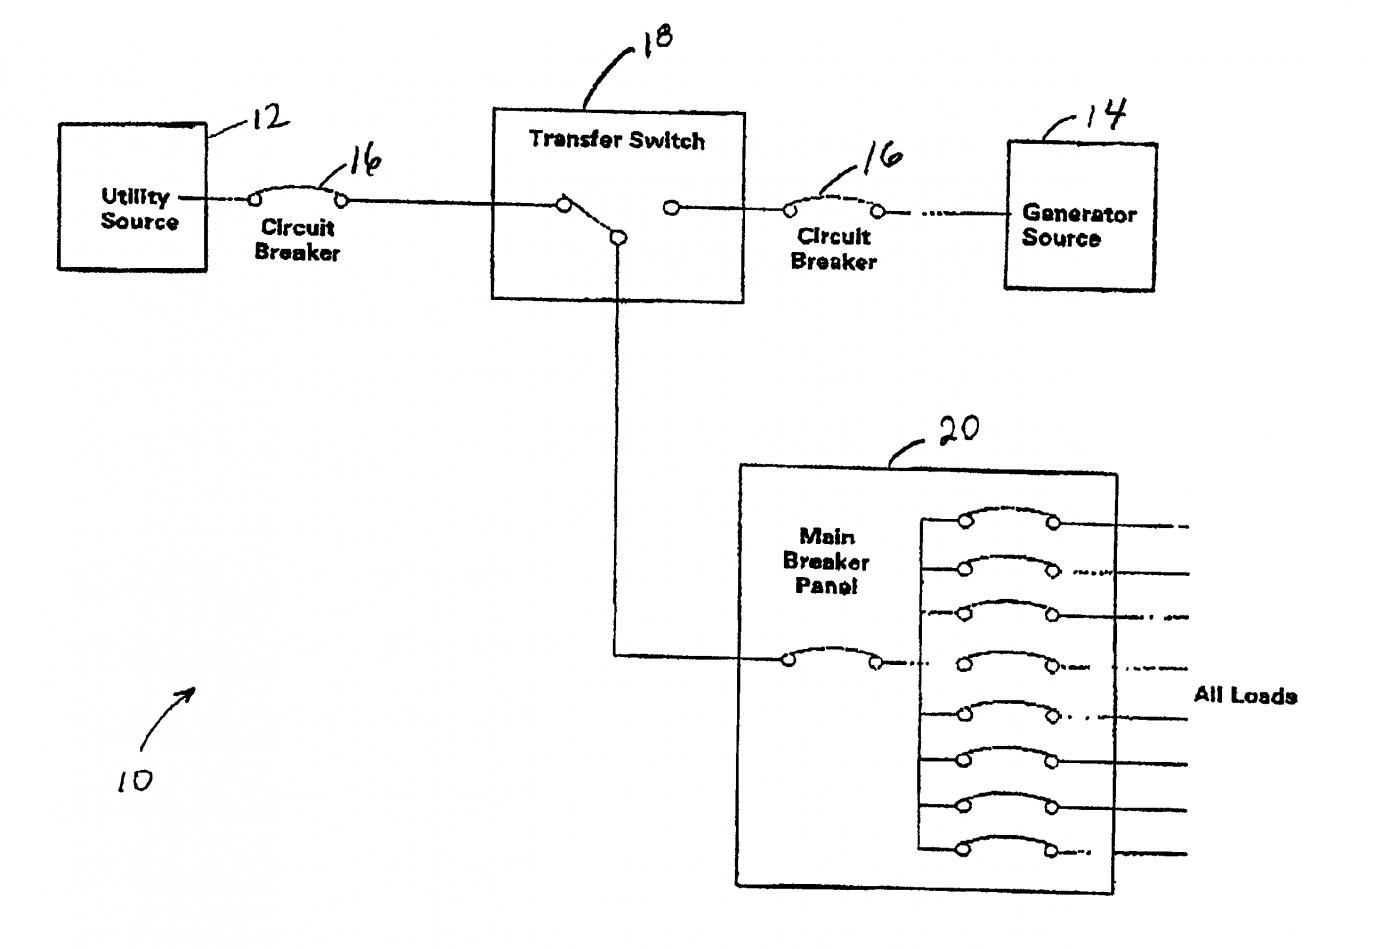 Asco Automatic Transfer Switch Wiring Diagram